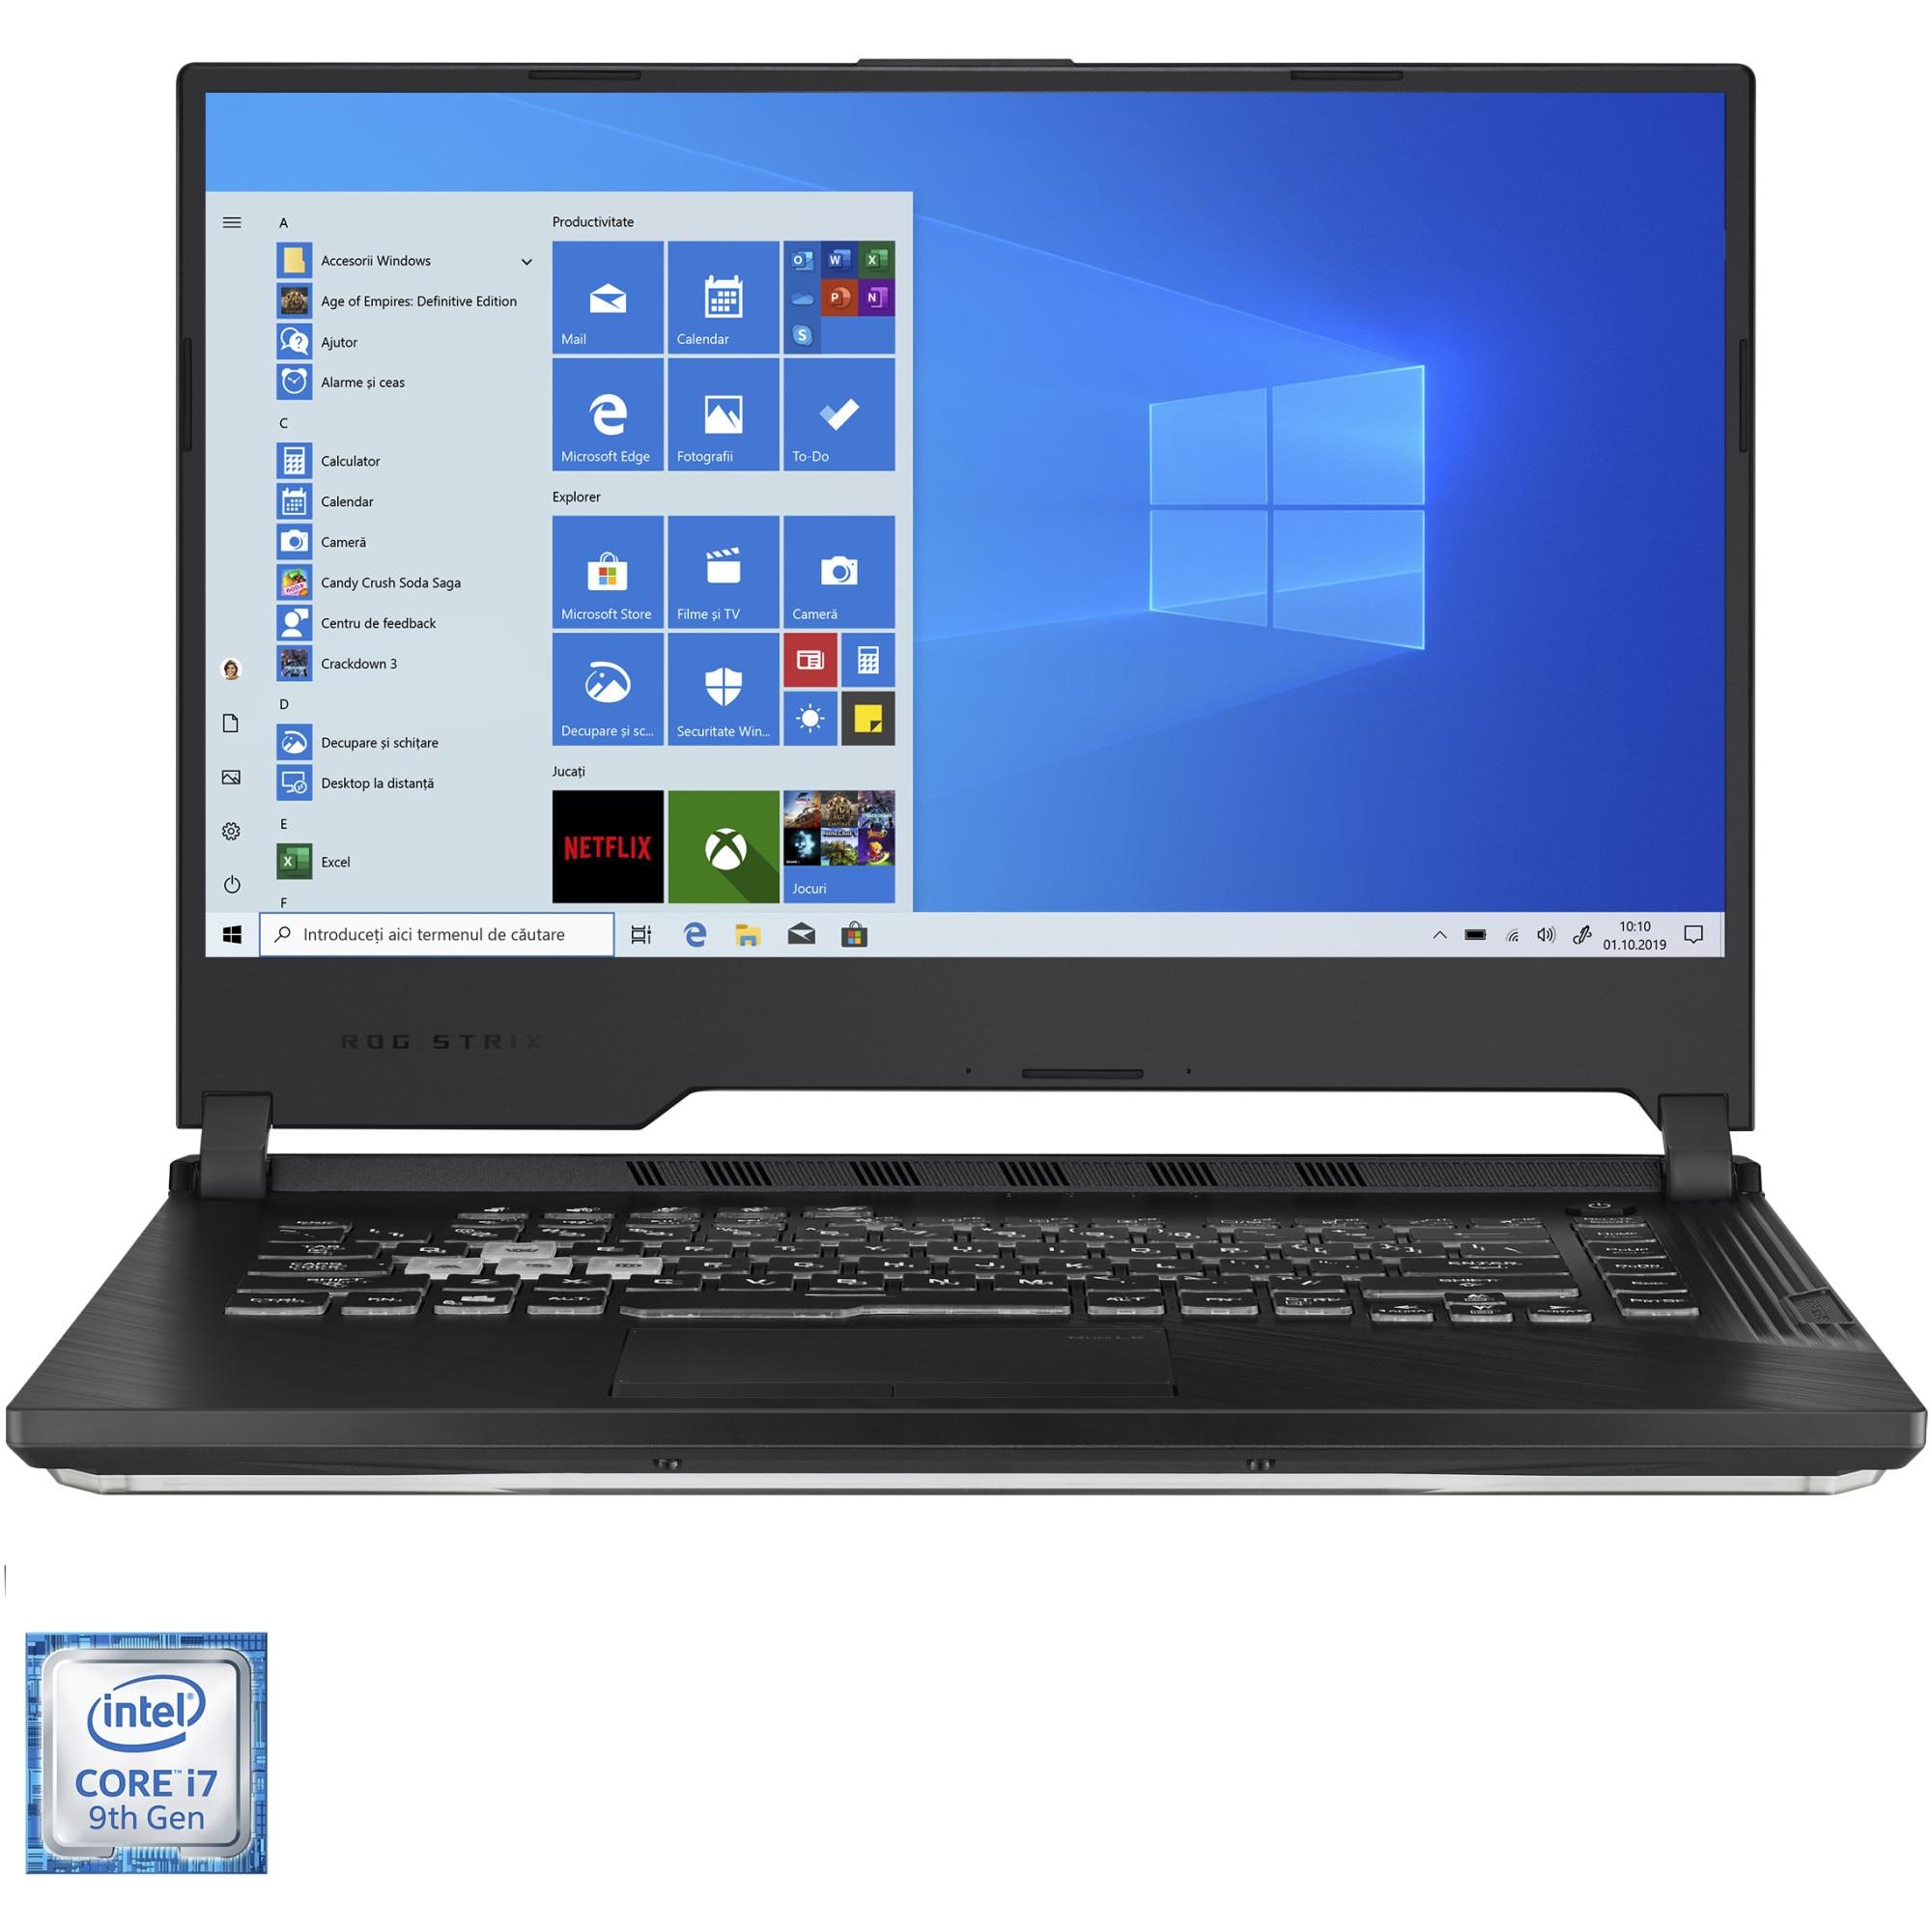 "Fotografie Laptop Gaming ASUS ROG Strix G G531GW cu procesor Intel® Core™ i7-9750H pana la 4.50 GHz Coffee Lake, 15.6"", Full HD, 120Hz, 16GB, 1TB SSD, NVIDIA® GeForce RTX™ 2070 8GB, Windows 10 Home, Black"